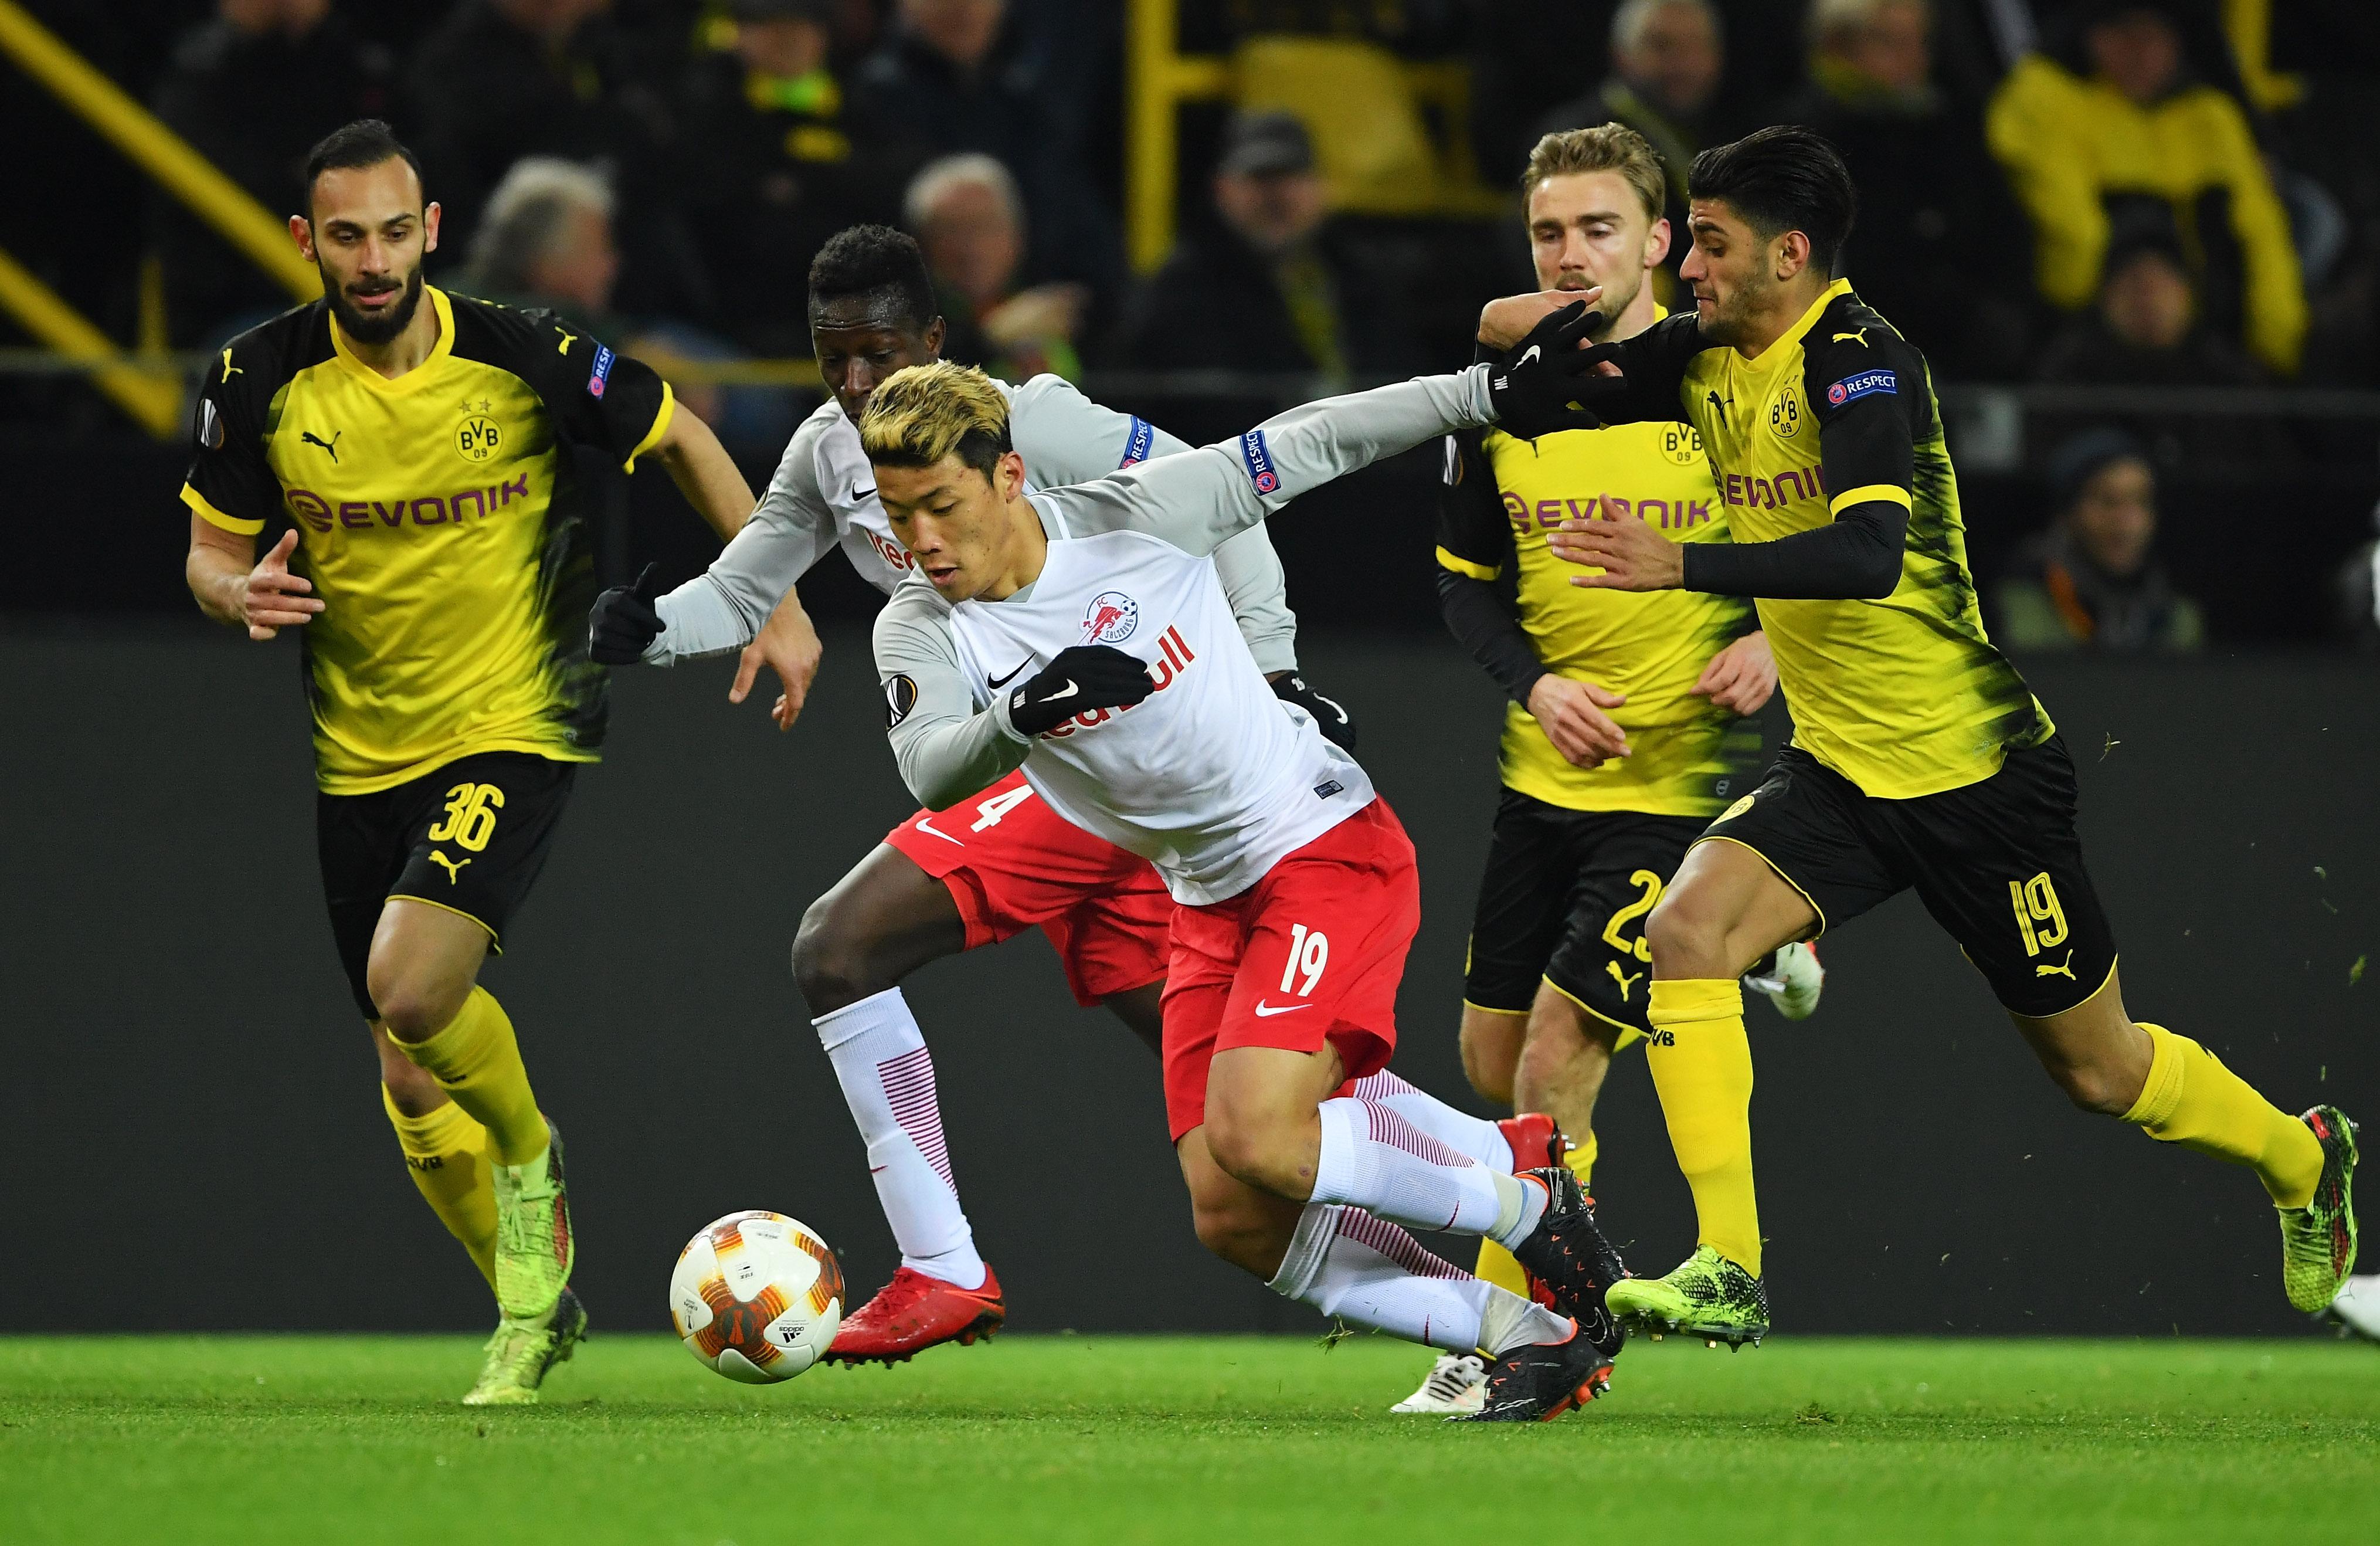 Hwang Hee-Chan vs Dortmund